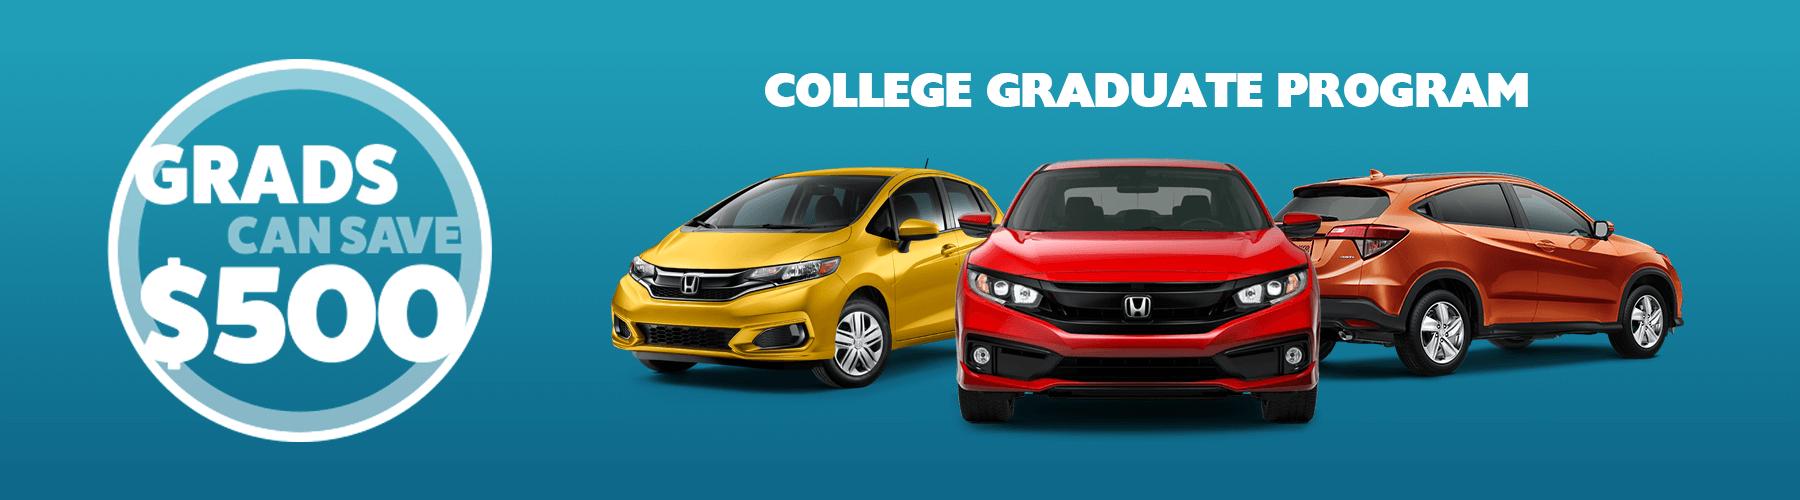 2019 Honda College Graduate Program Slider